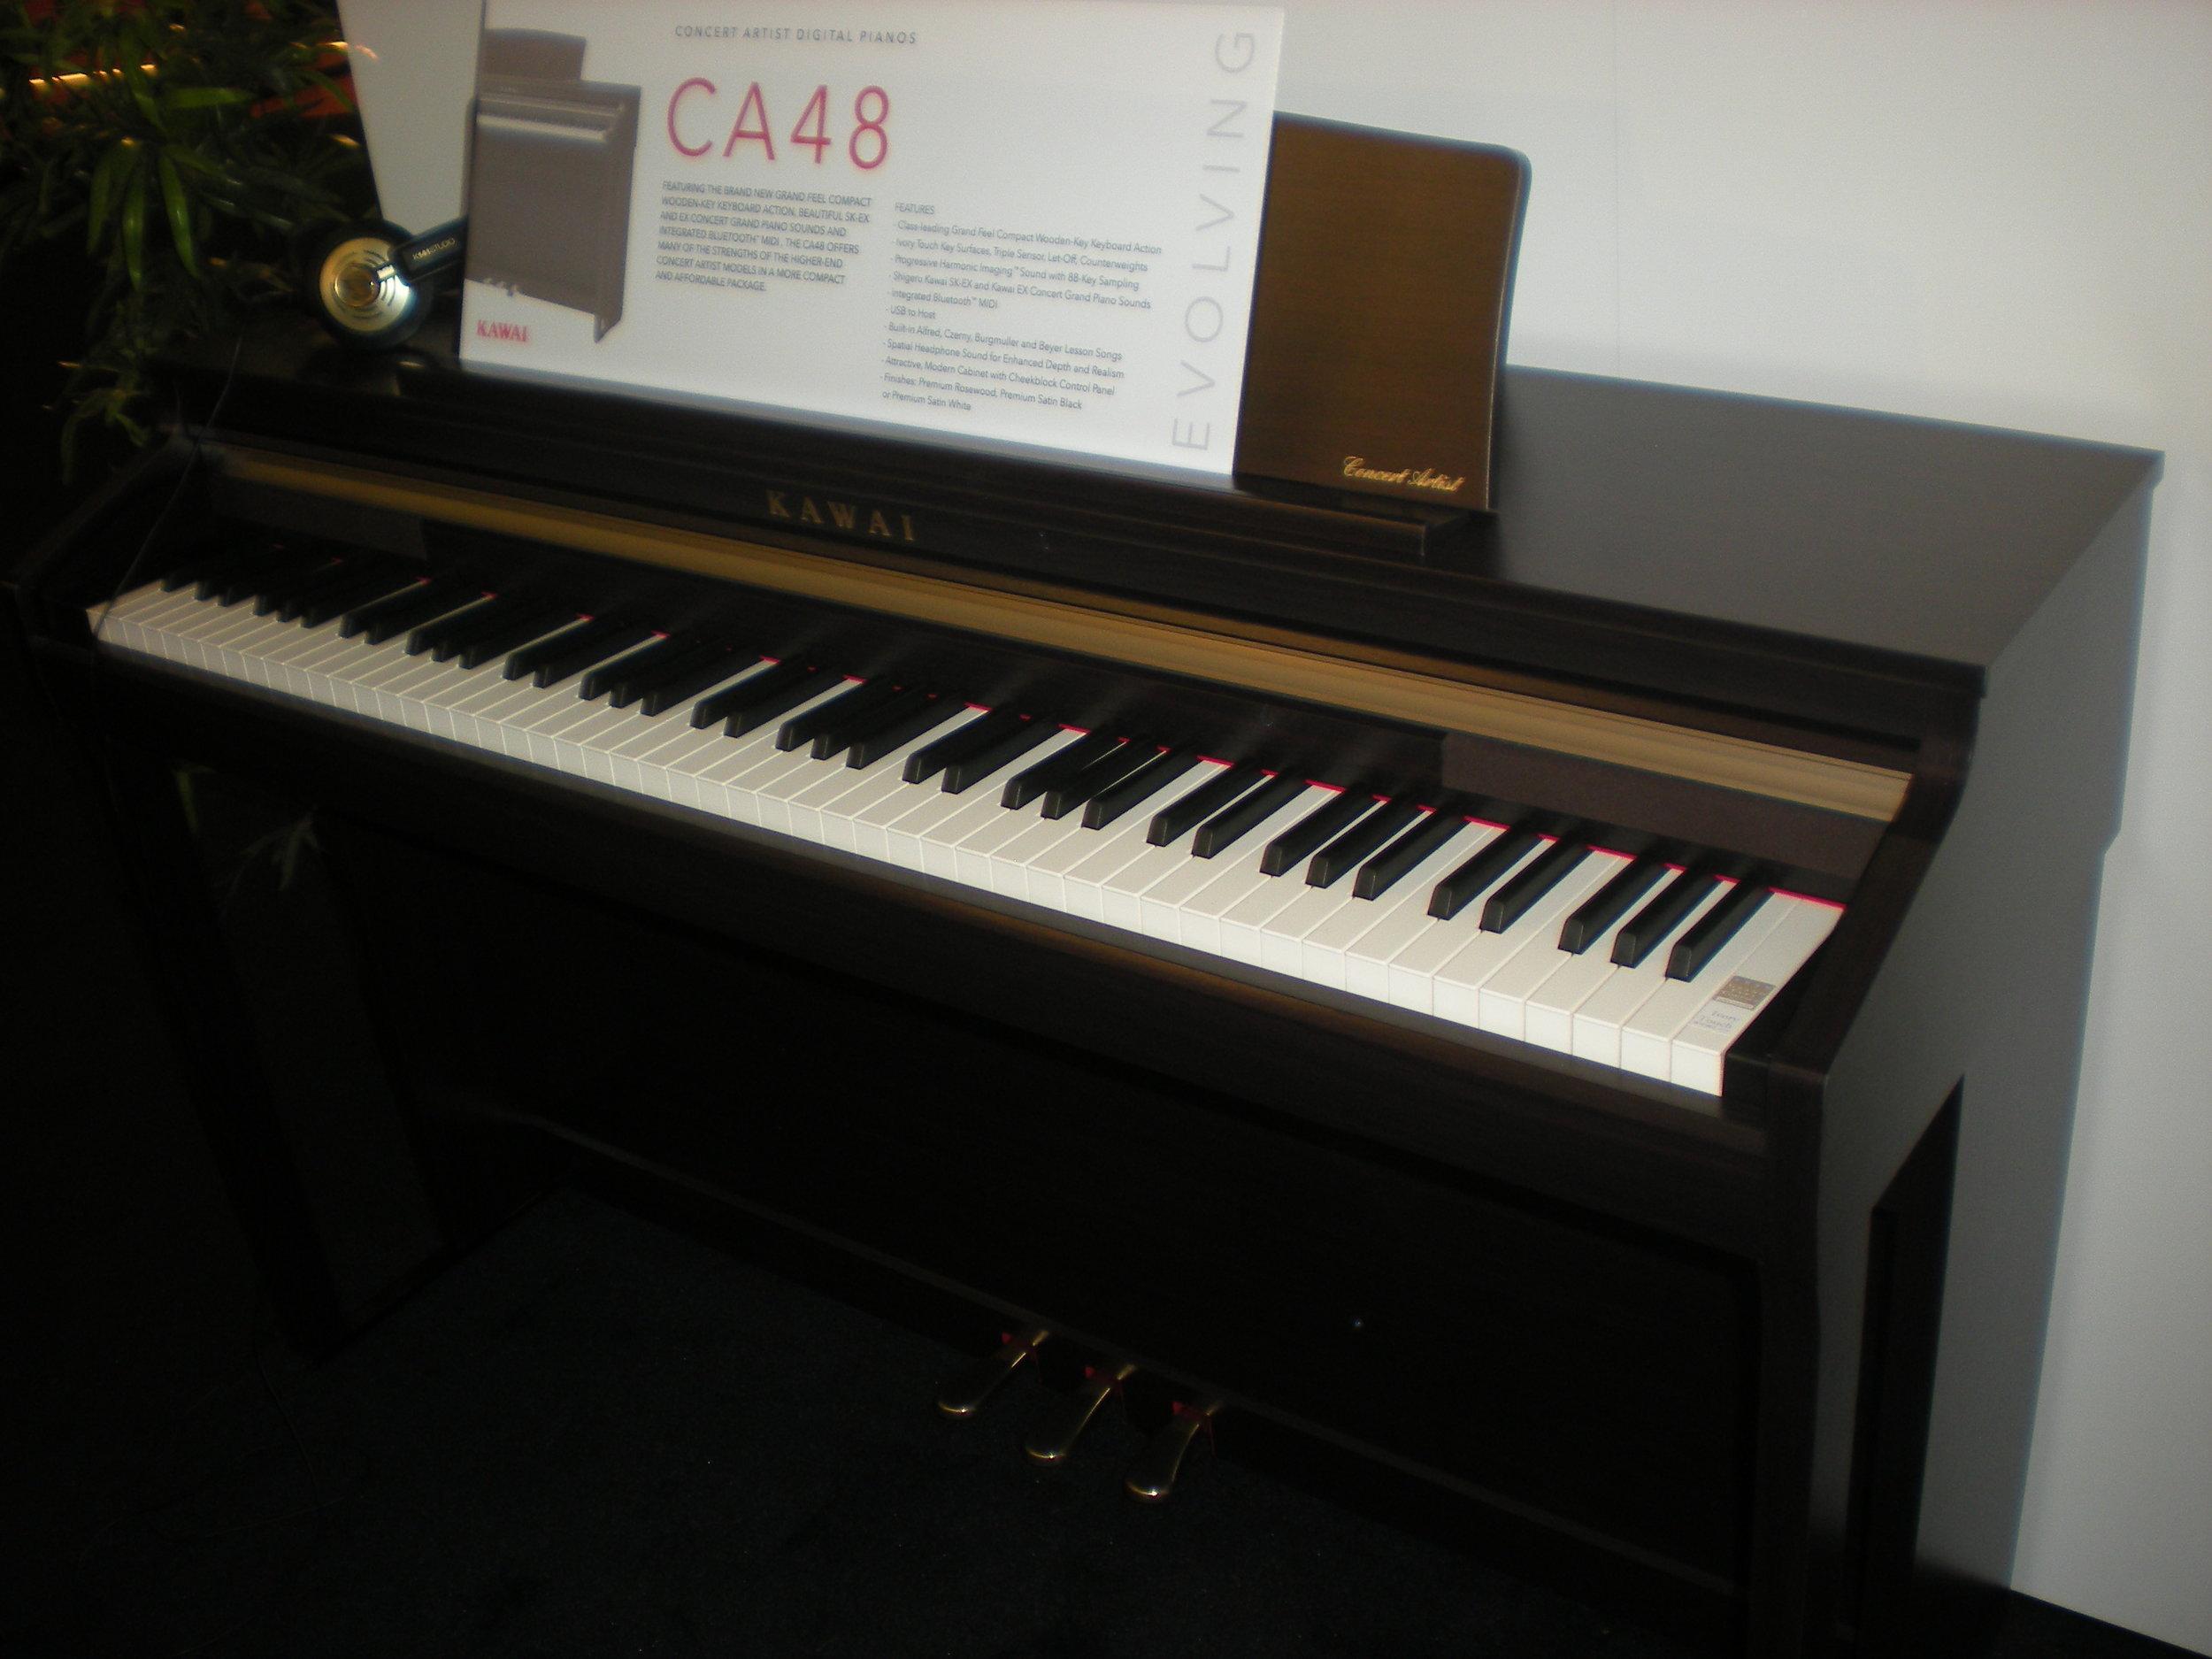 Kawai CA48